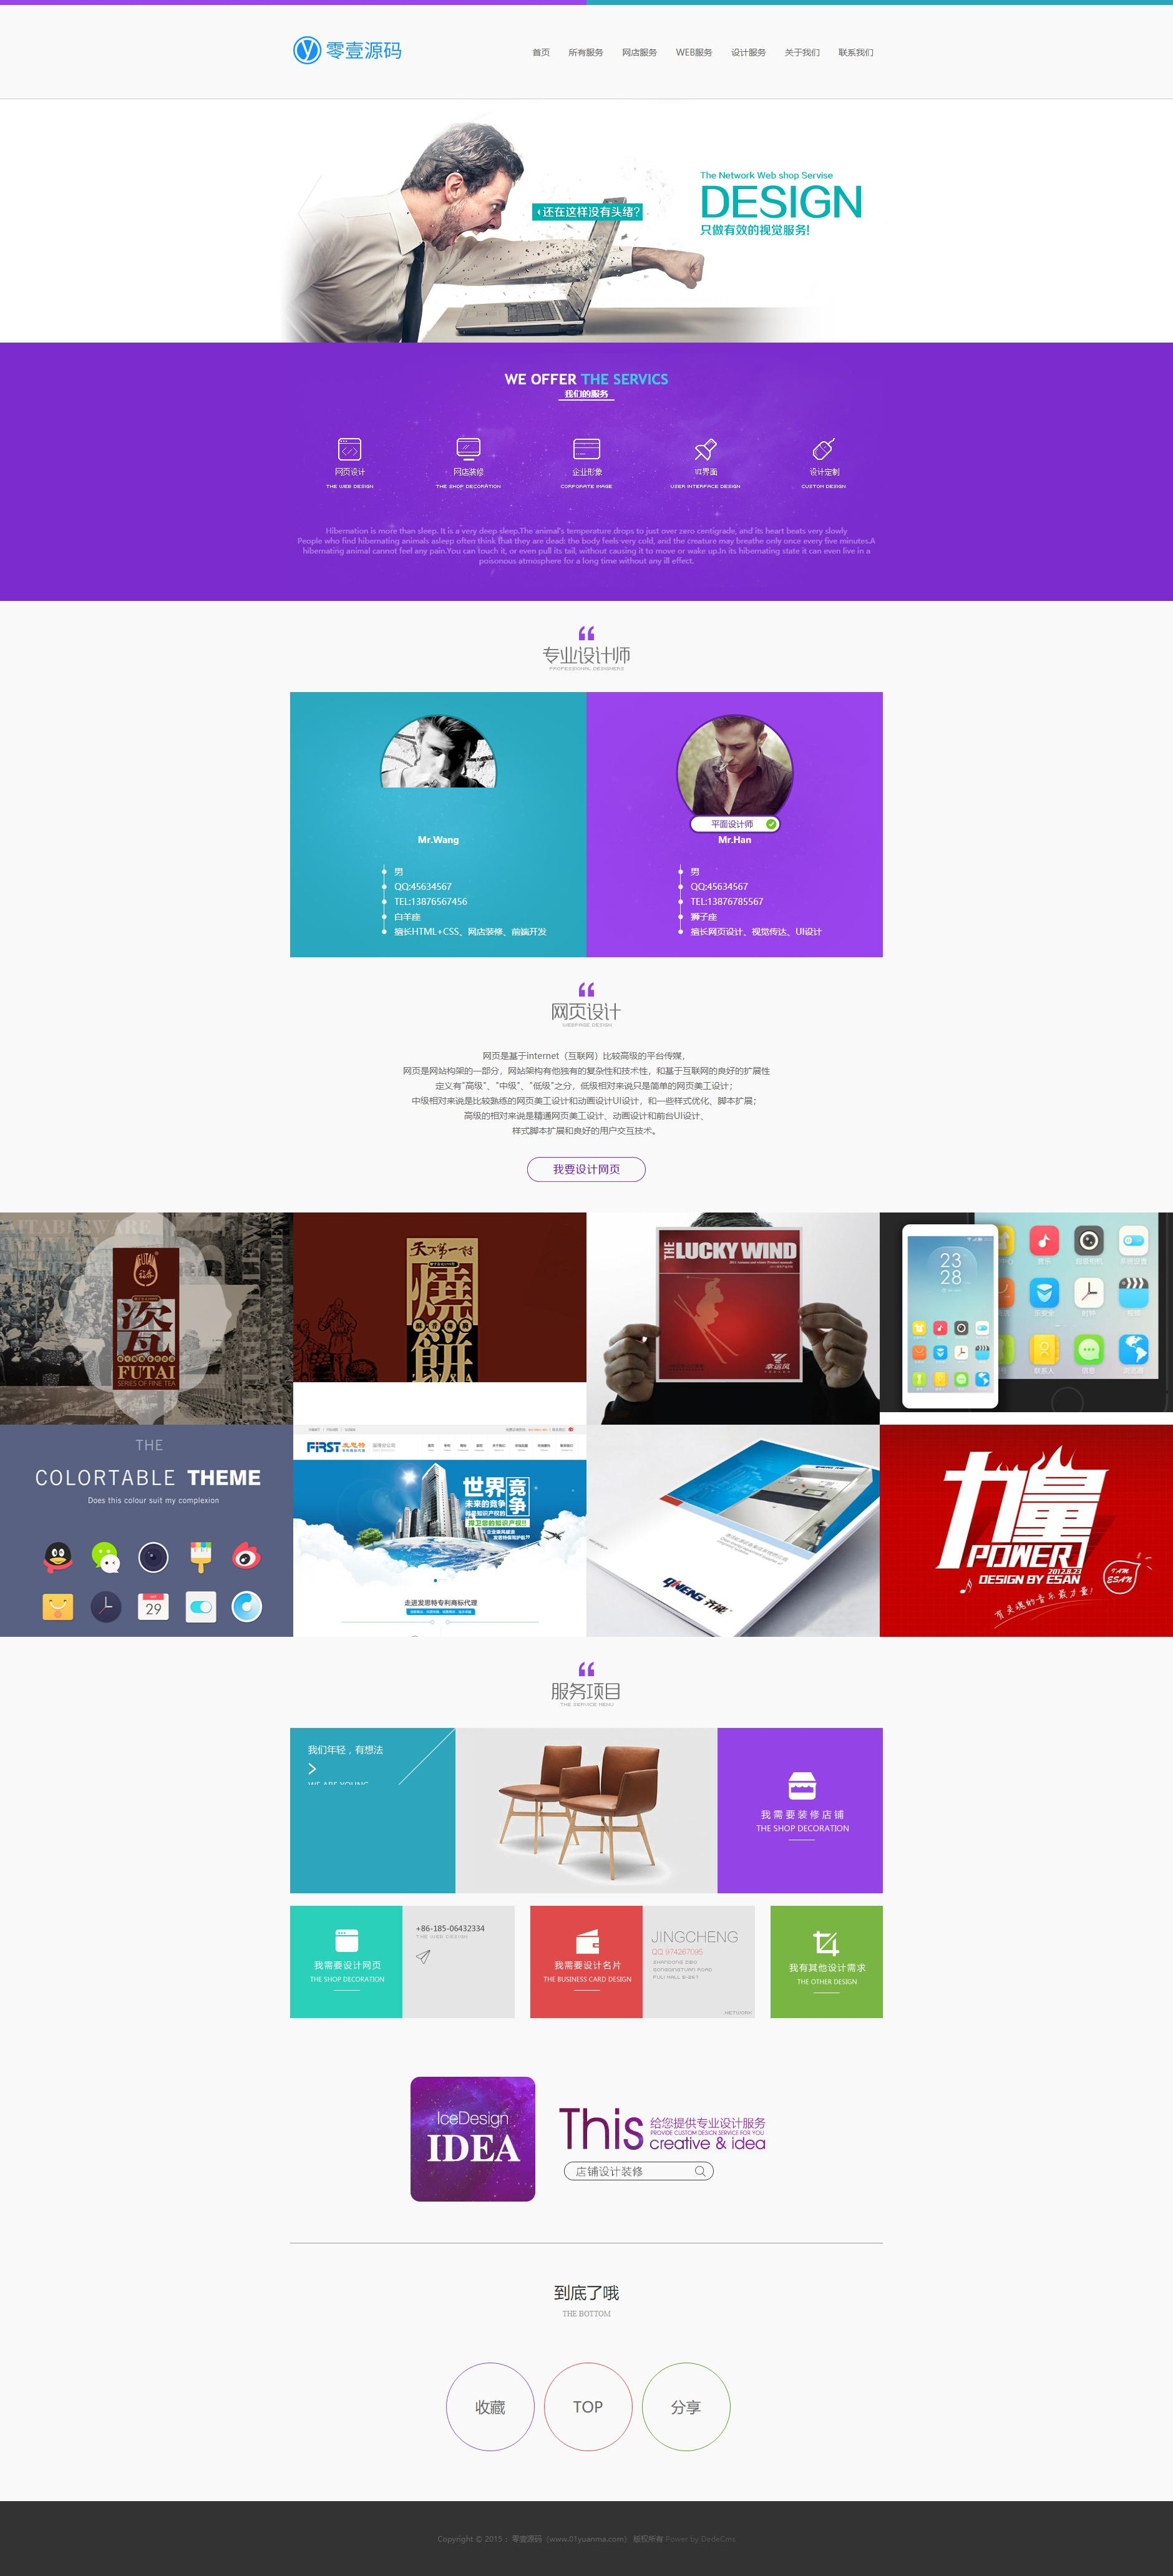 html5设计高端IT企业建站类企业织梦dedecms网站模板